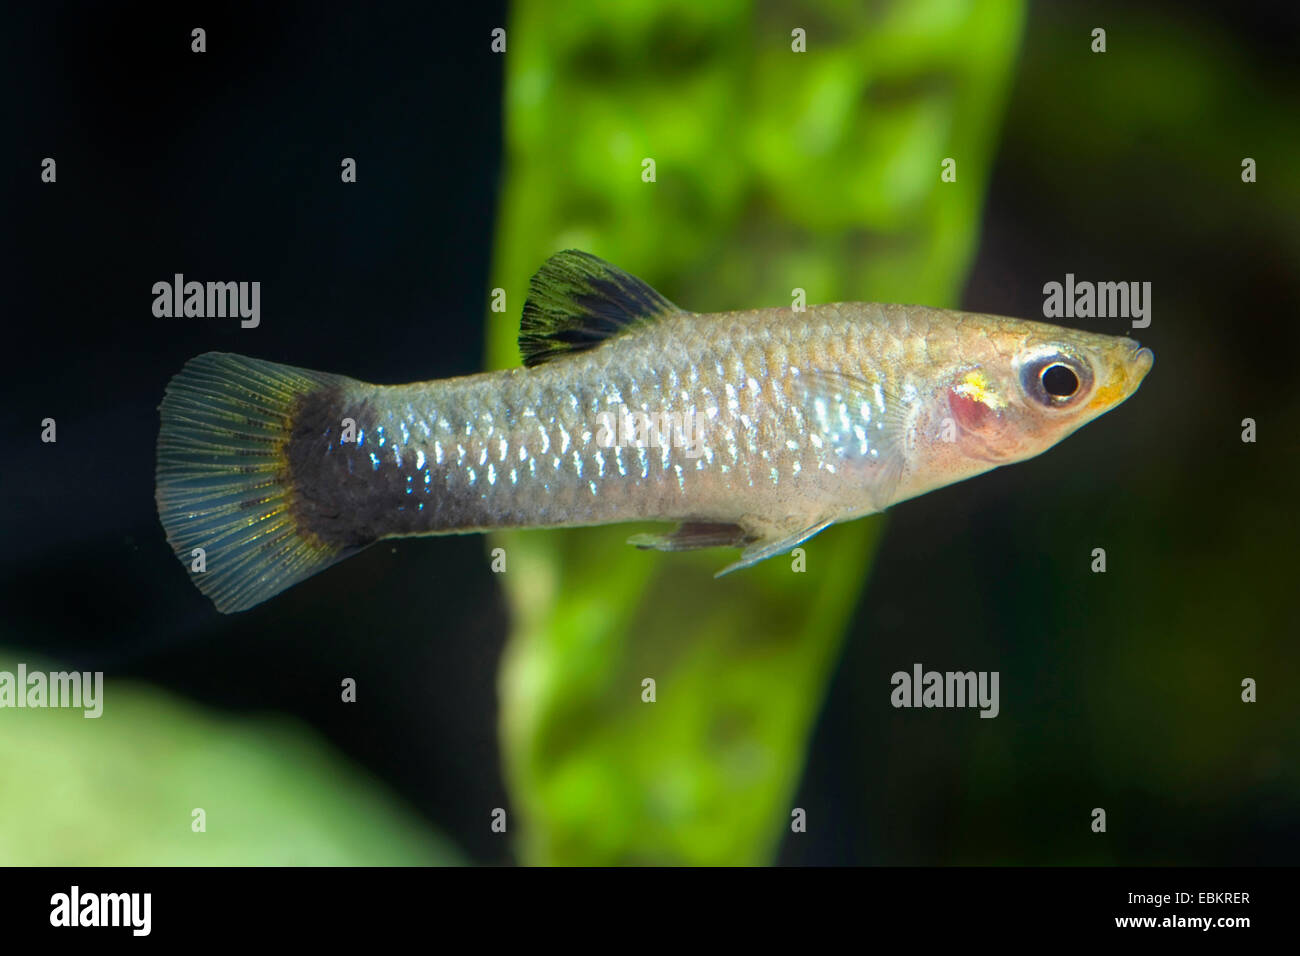 black-bellied molly, blue limia, blackbelly limia (Poecilia melanogaster, Limia melanogaster), full length portrait Stock Photo